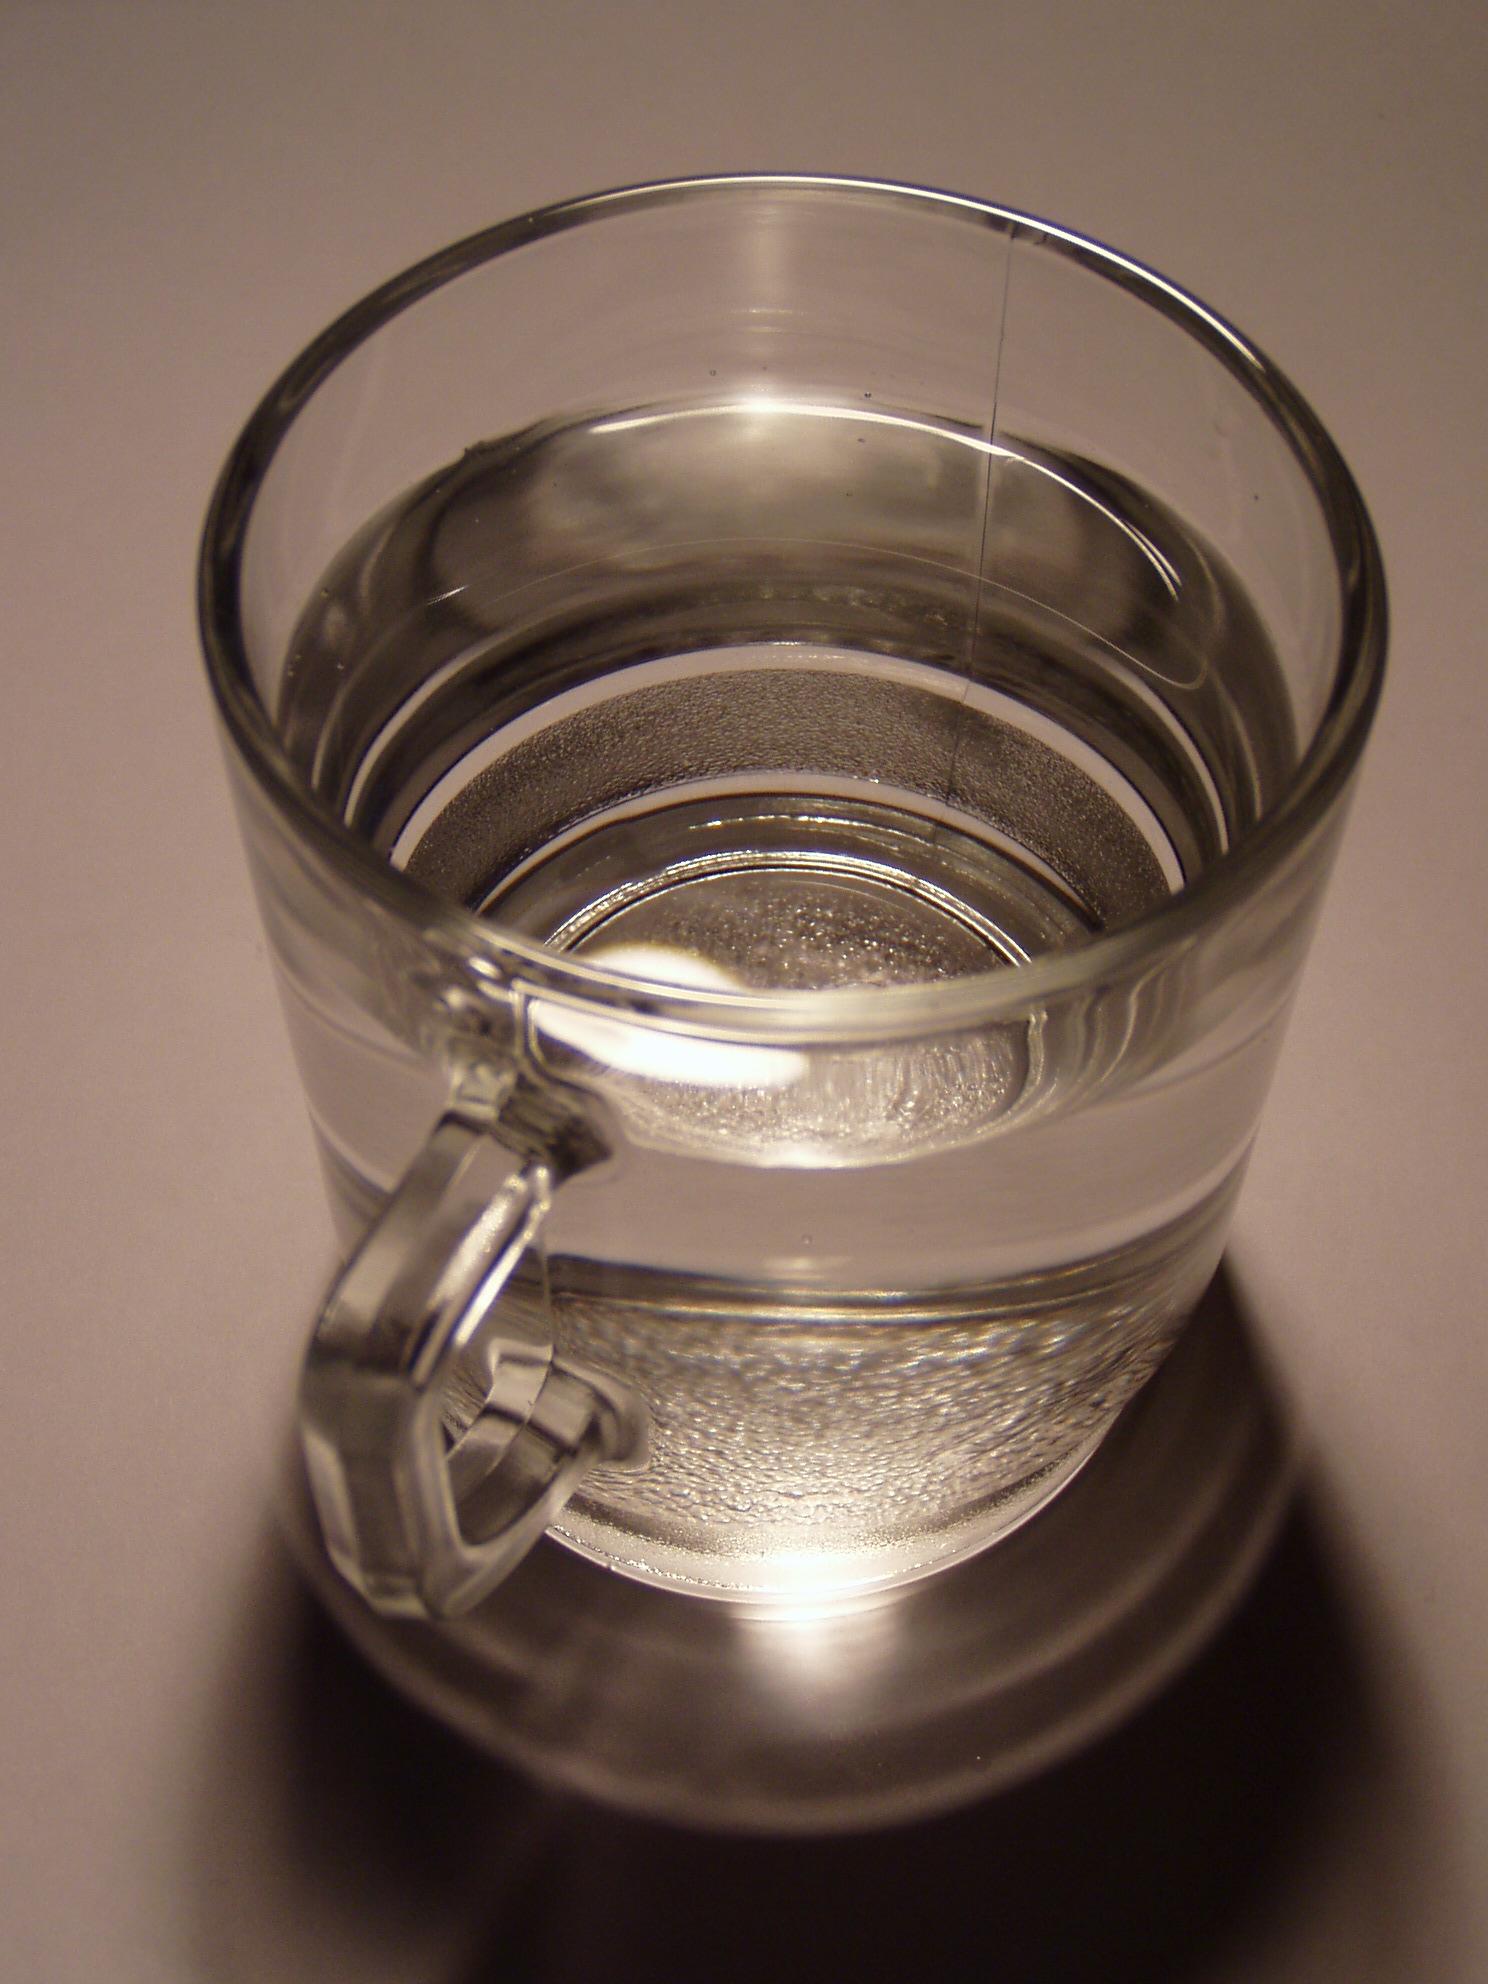 tasse-deau-chaude.jpg